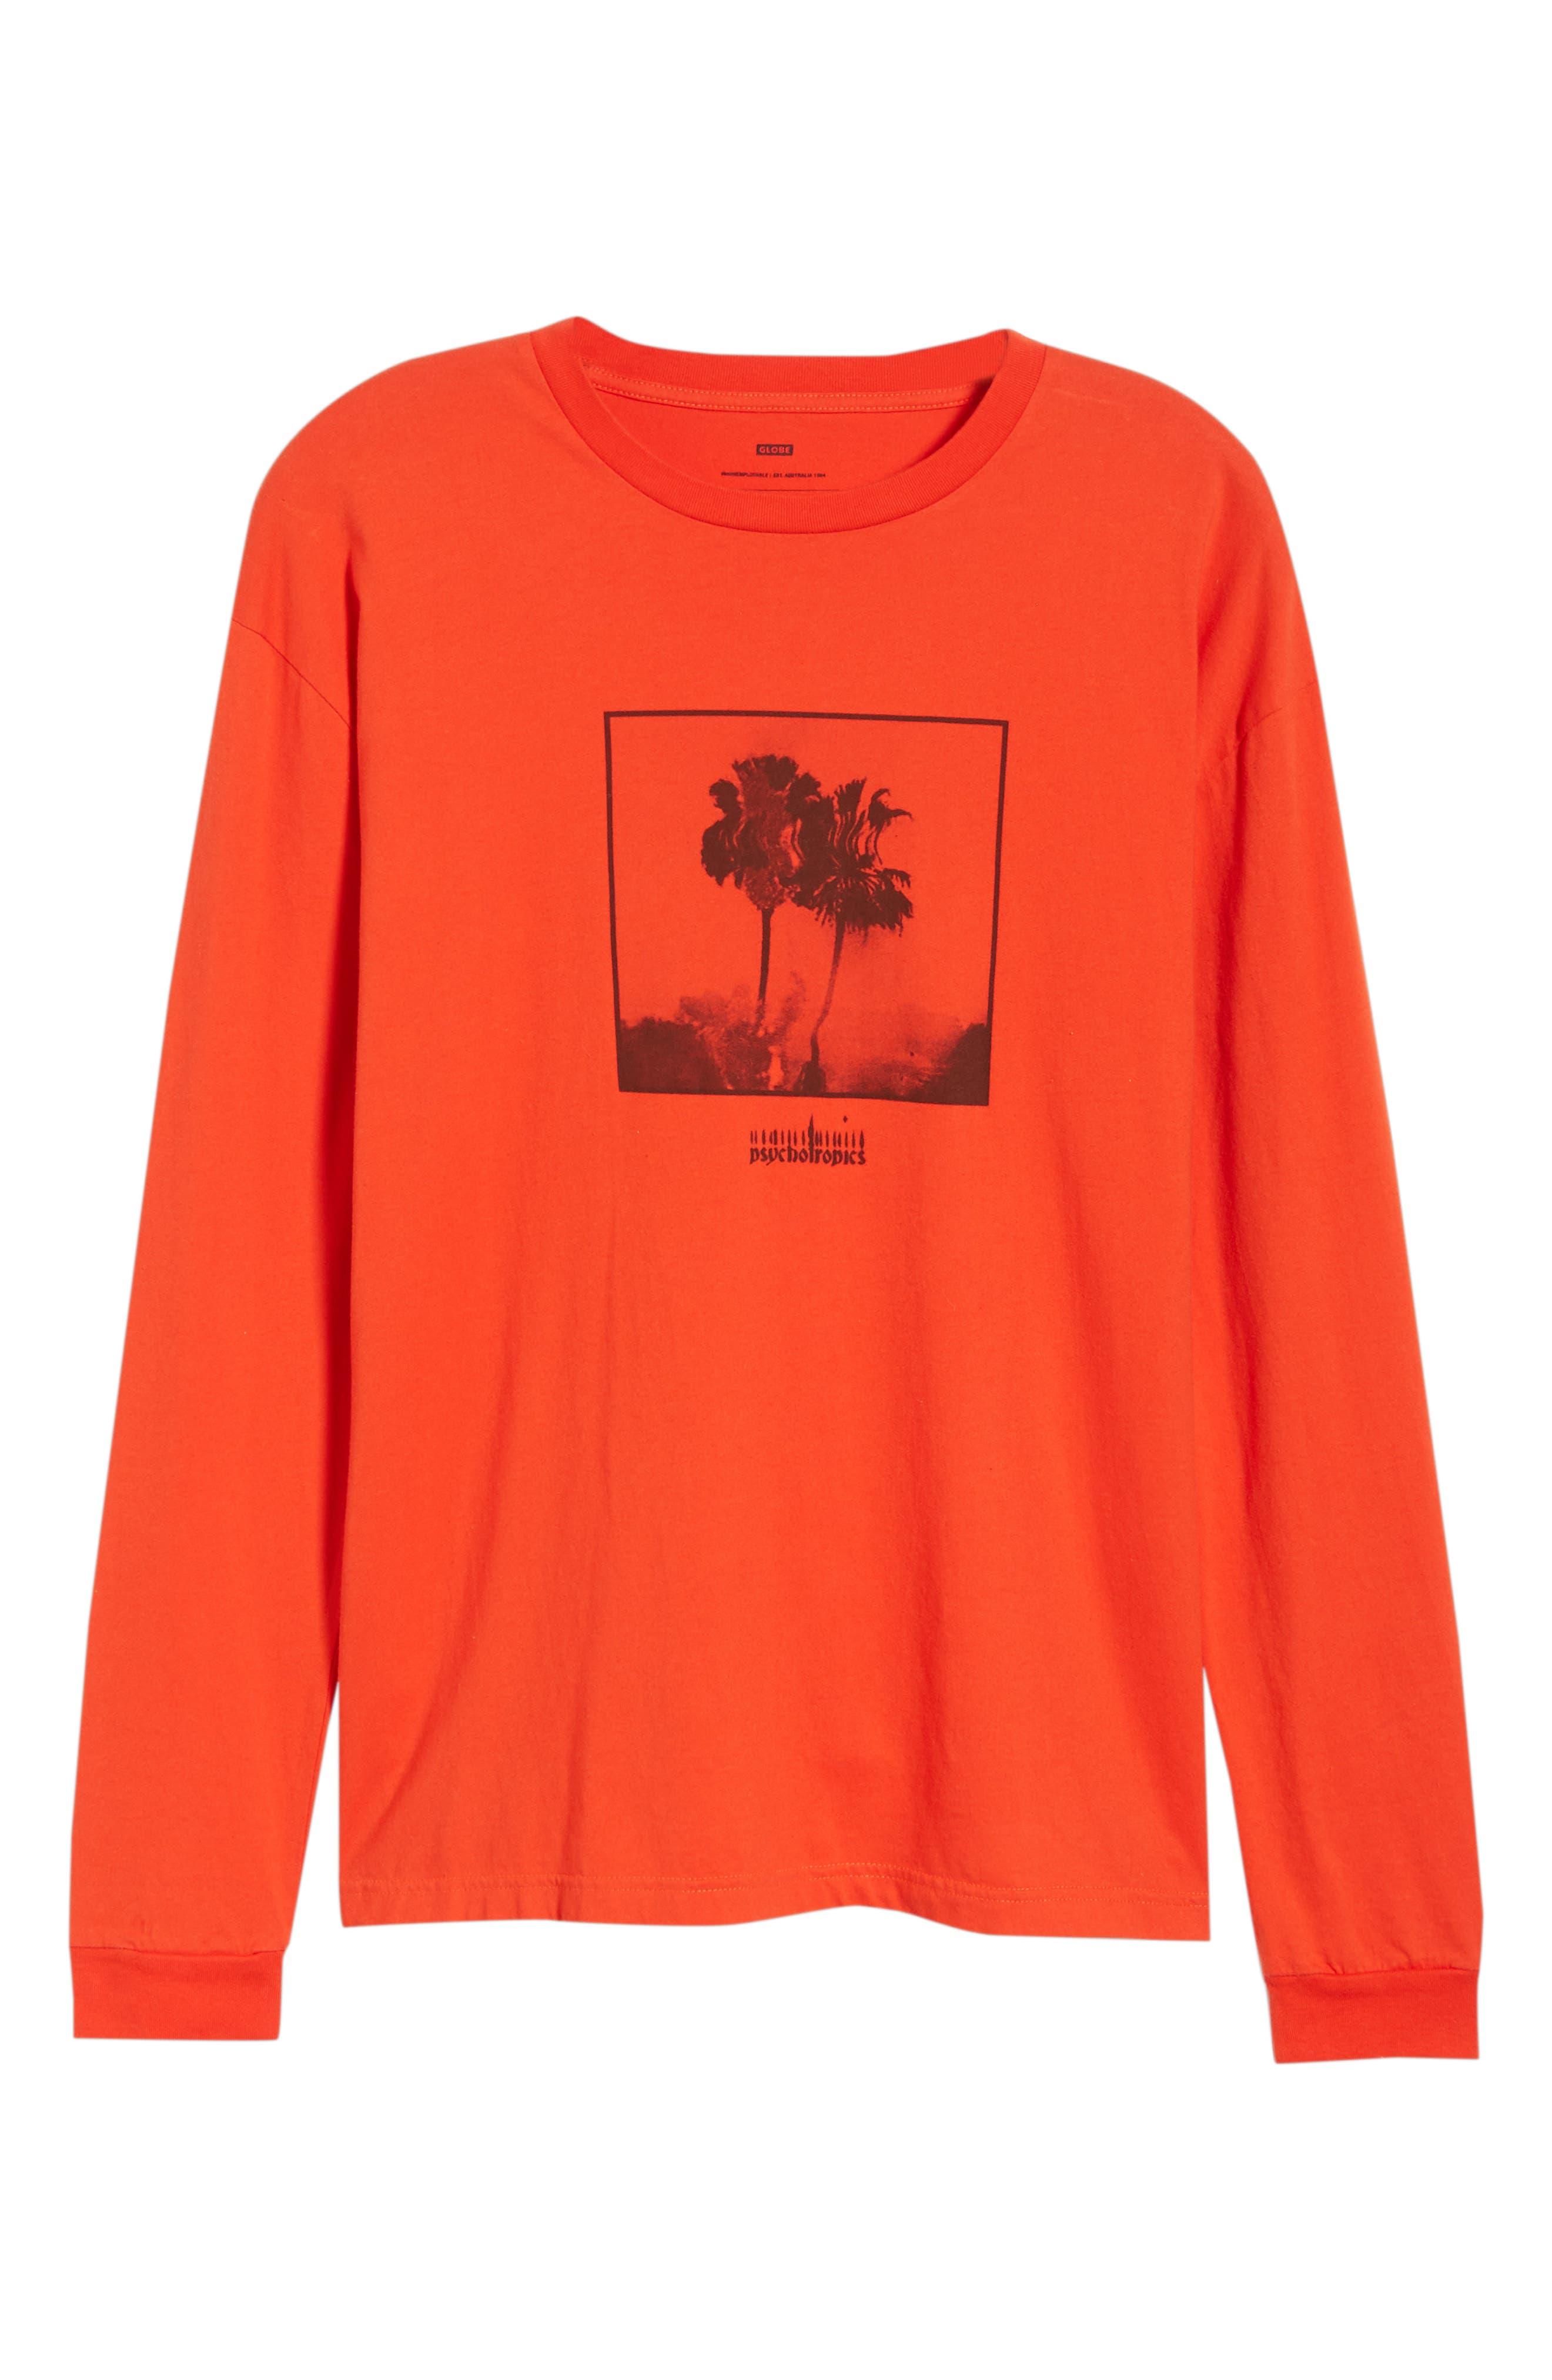 Psychotropics T-Shirt,                             Alternate thumbnail 6, color,                             806